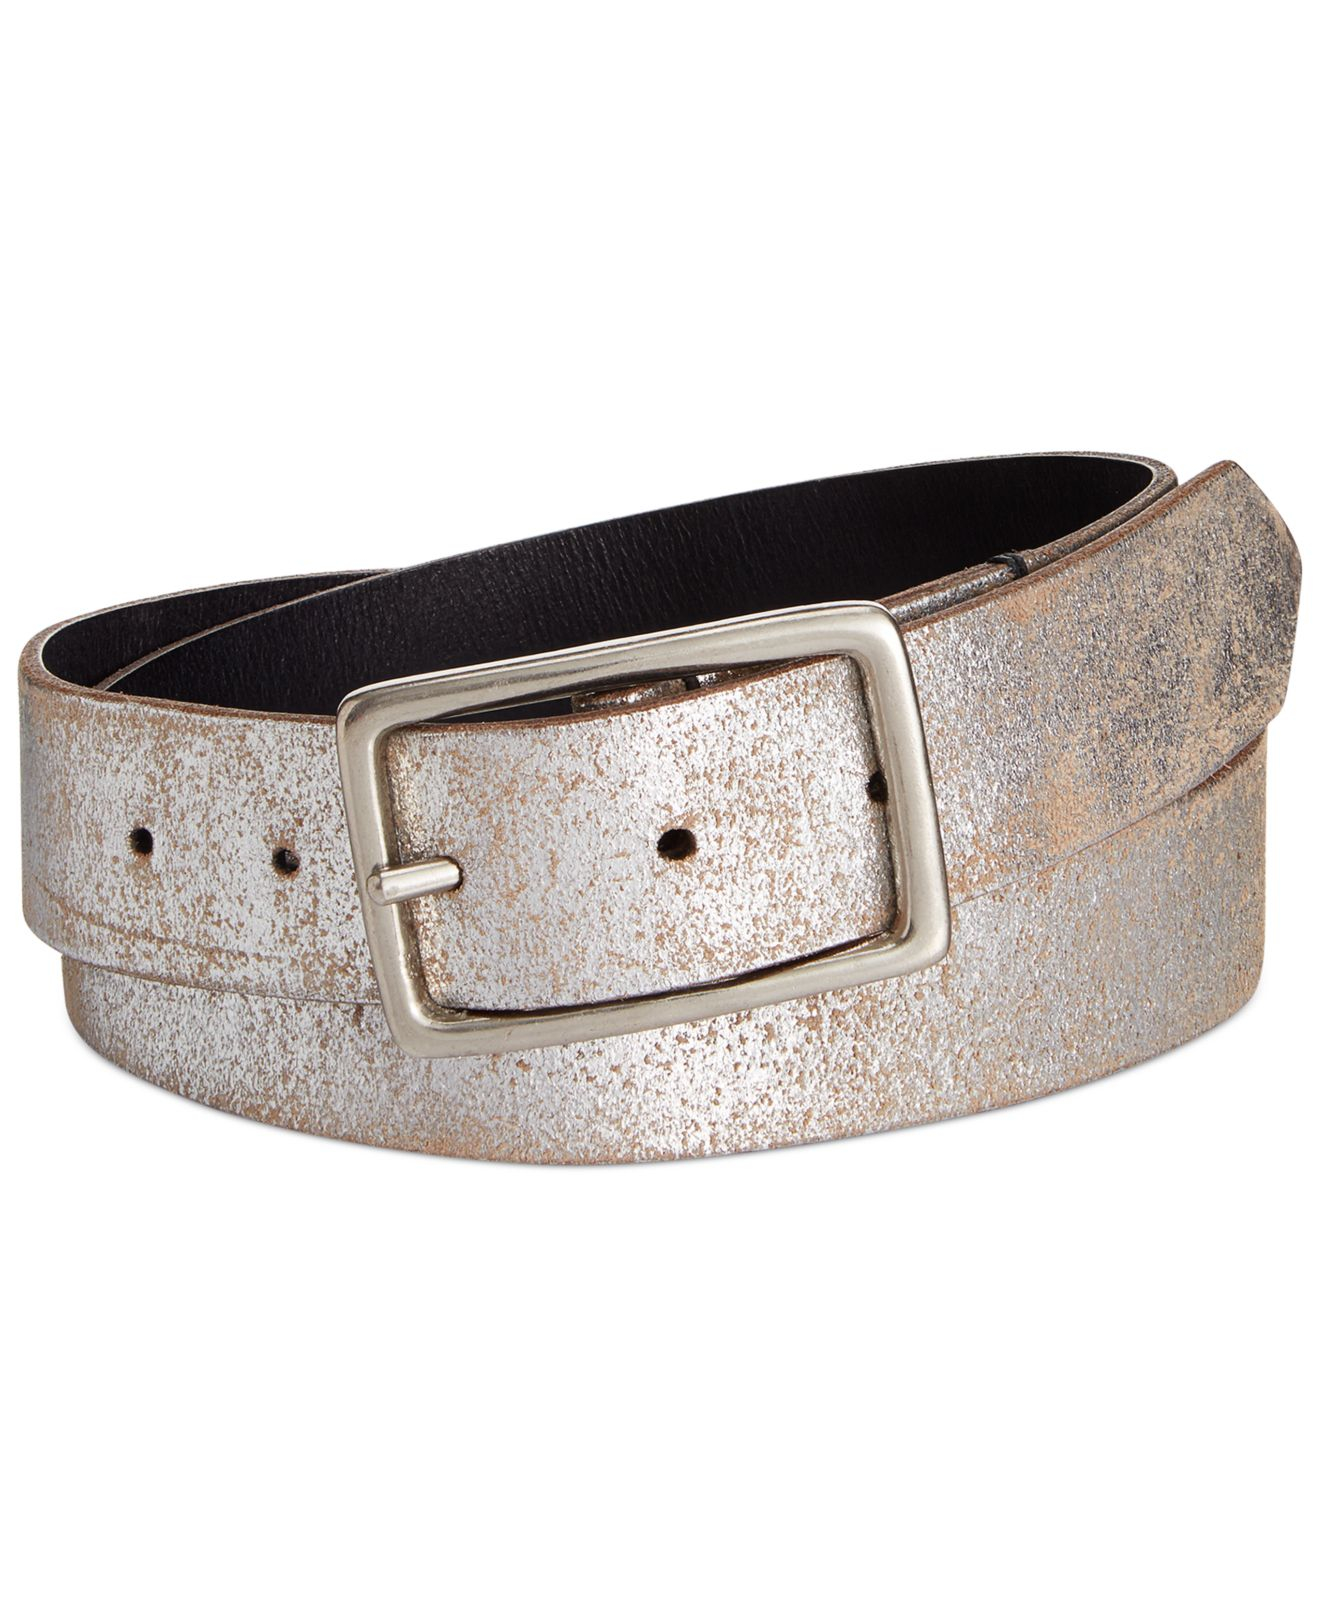 calvin klein reversible leather belt in brown lyst